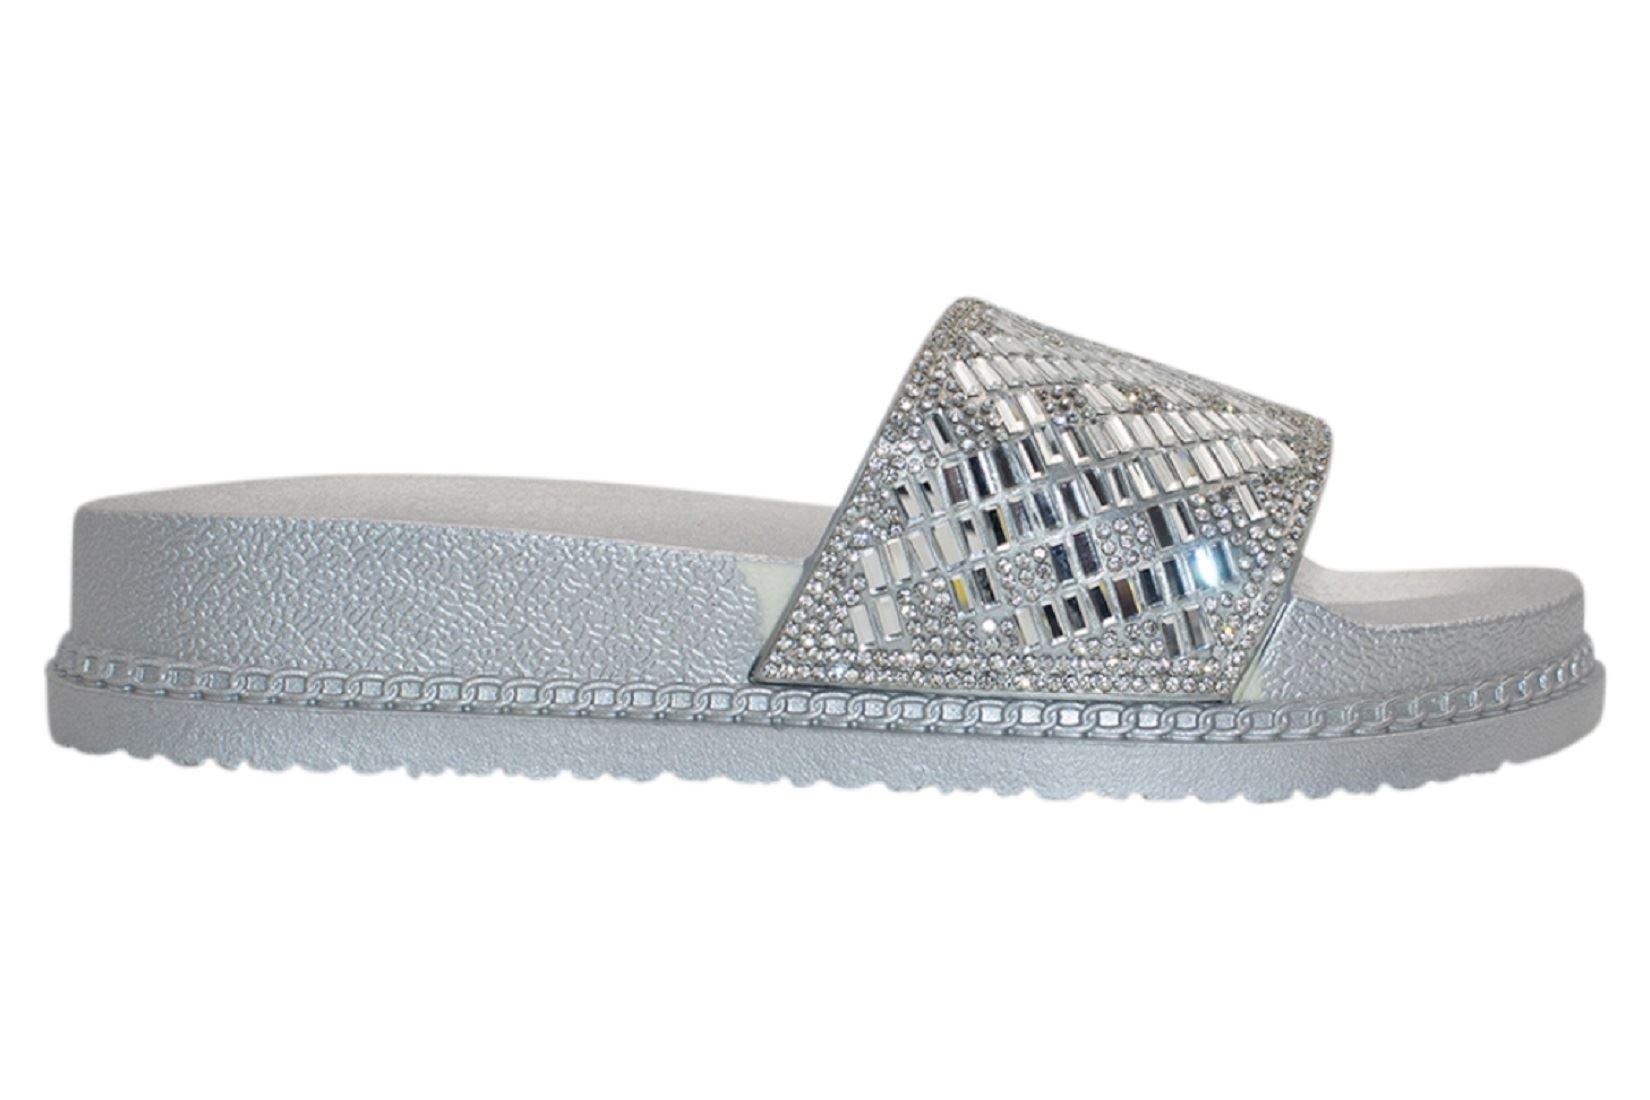 Womens-Sliders-Casual-Slippers-Mules-Ladies-Diamante-Flip-Flop-Sandals-Shoes thumbnail 72